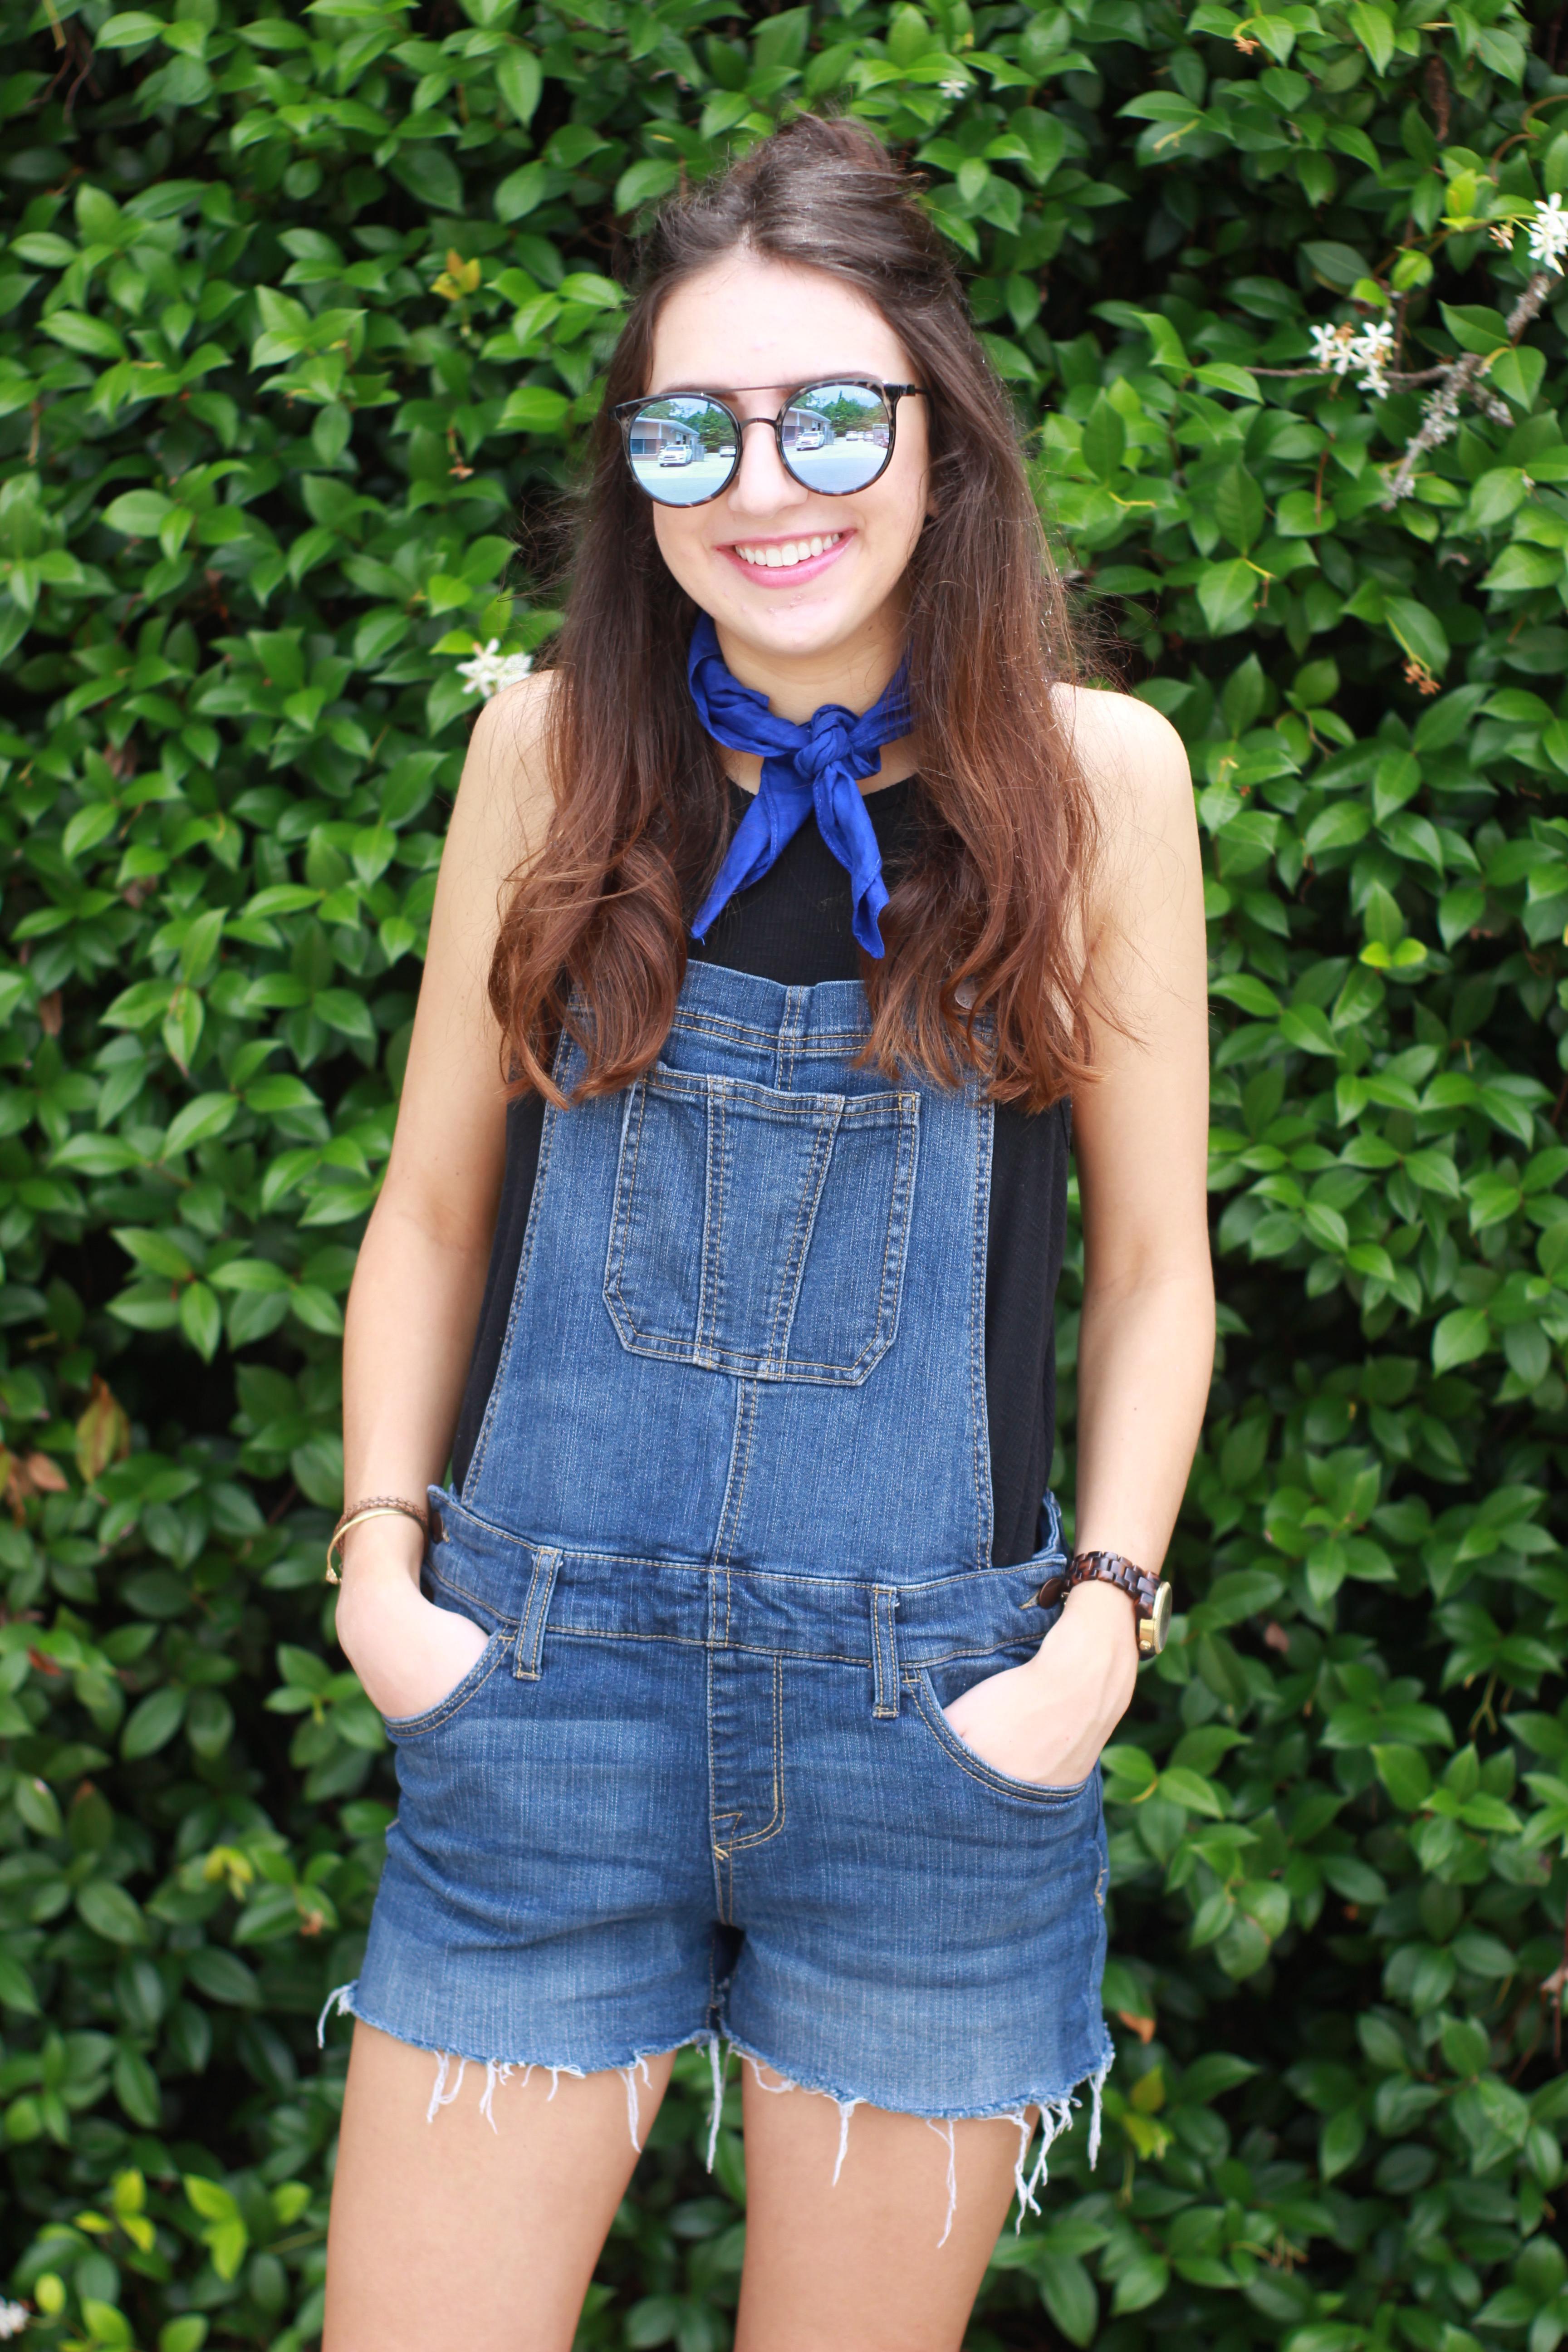 styling-overalls-5-lgip